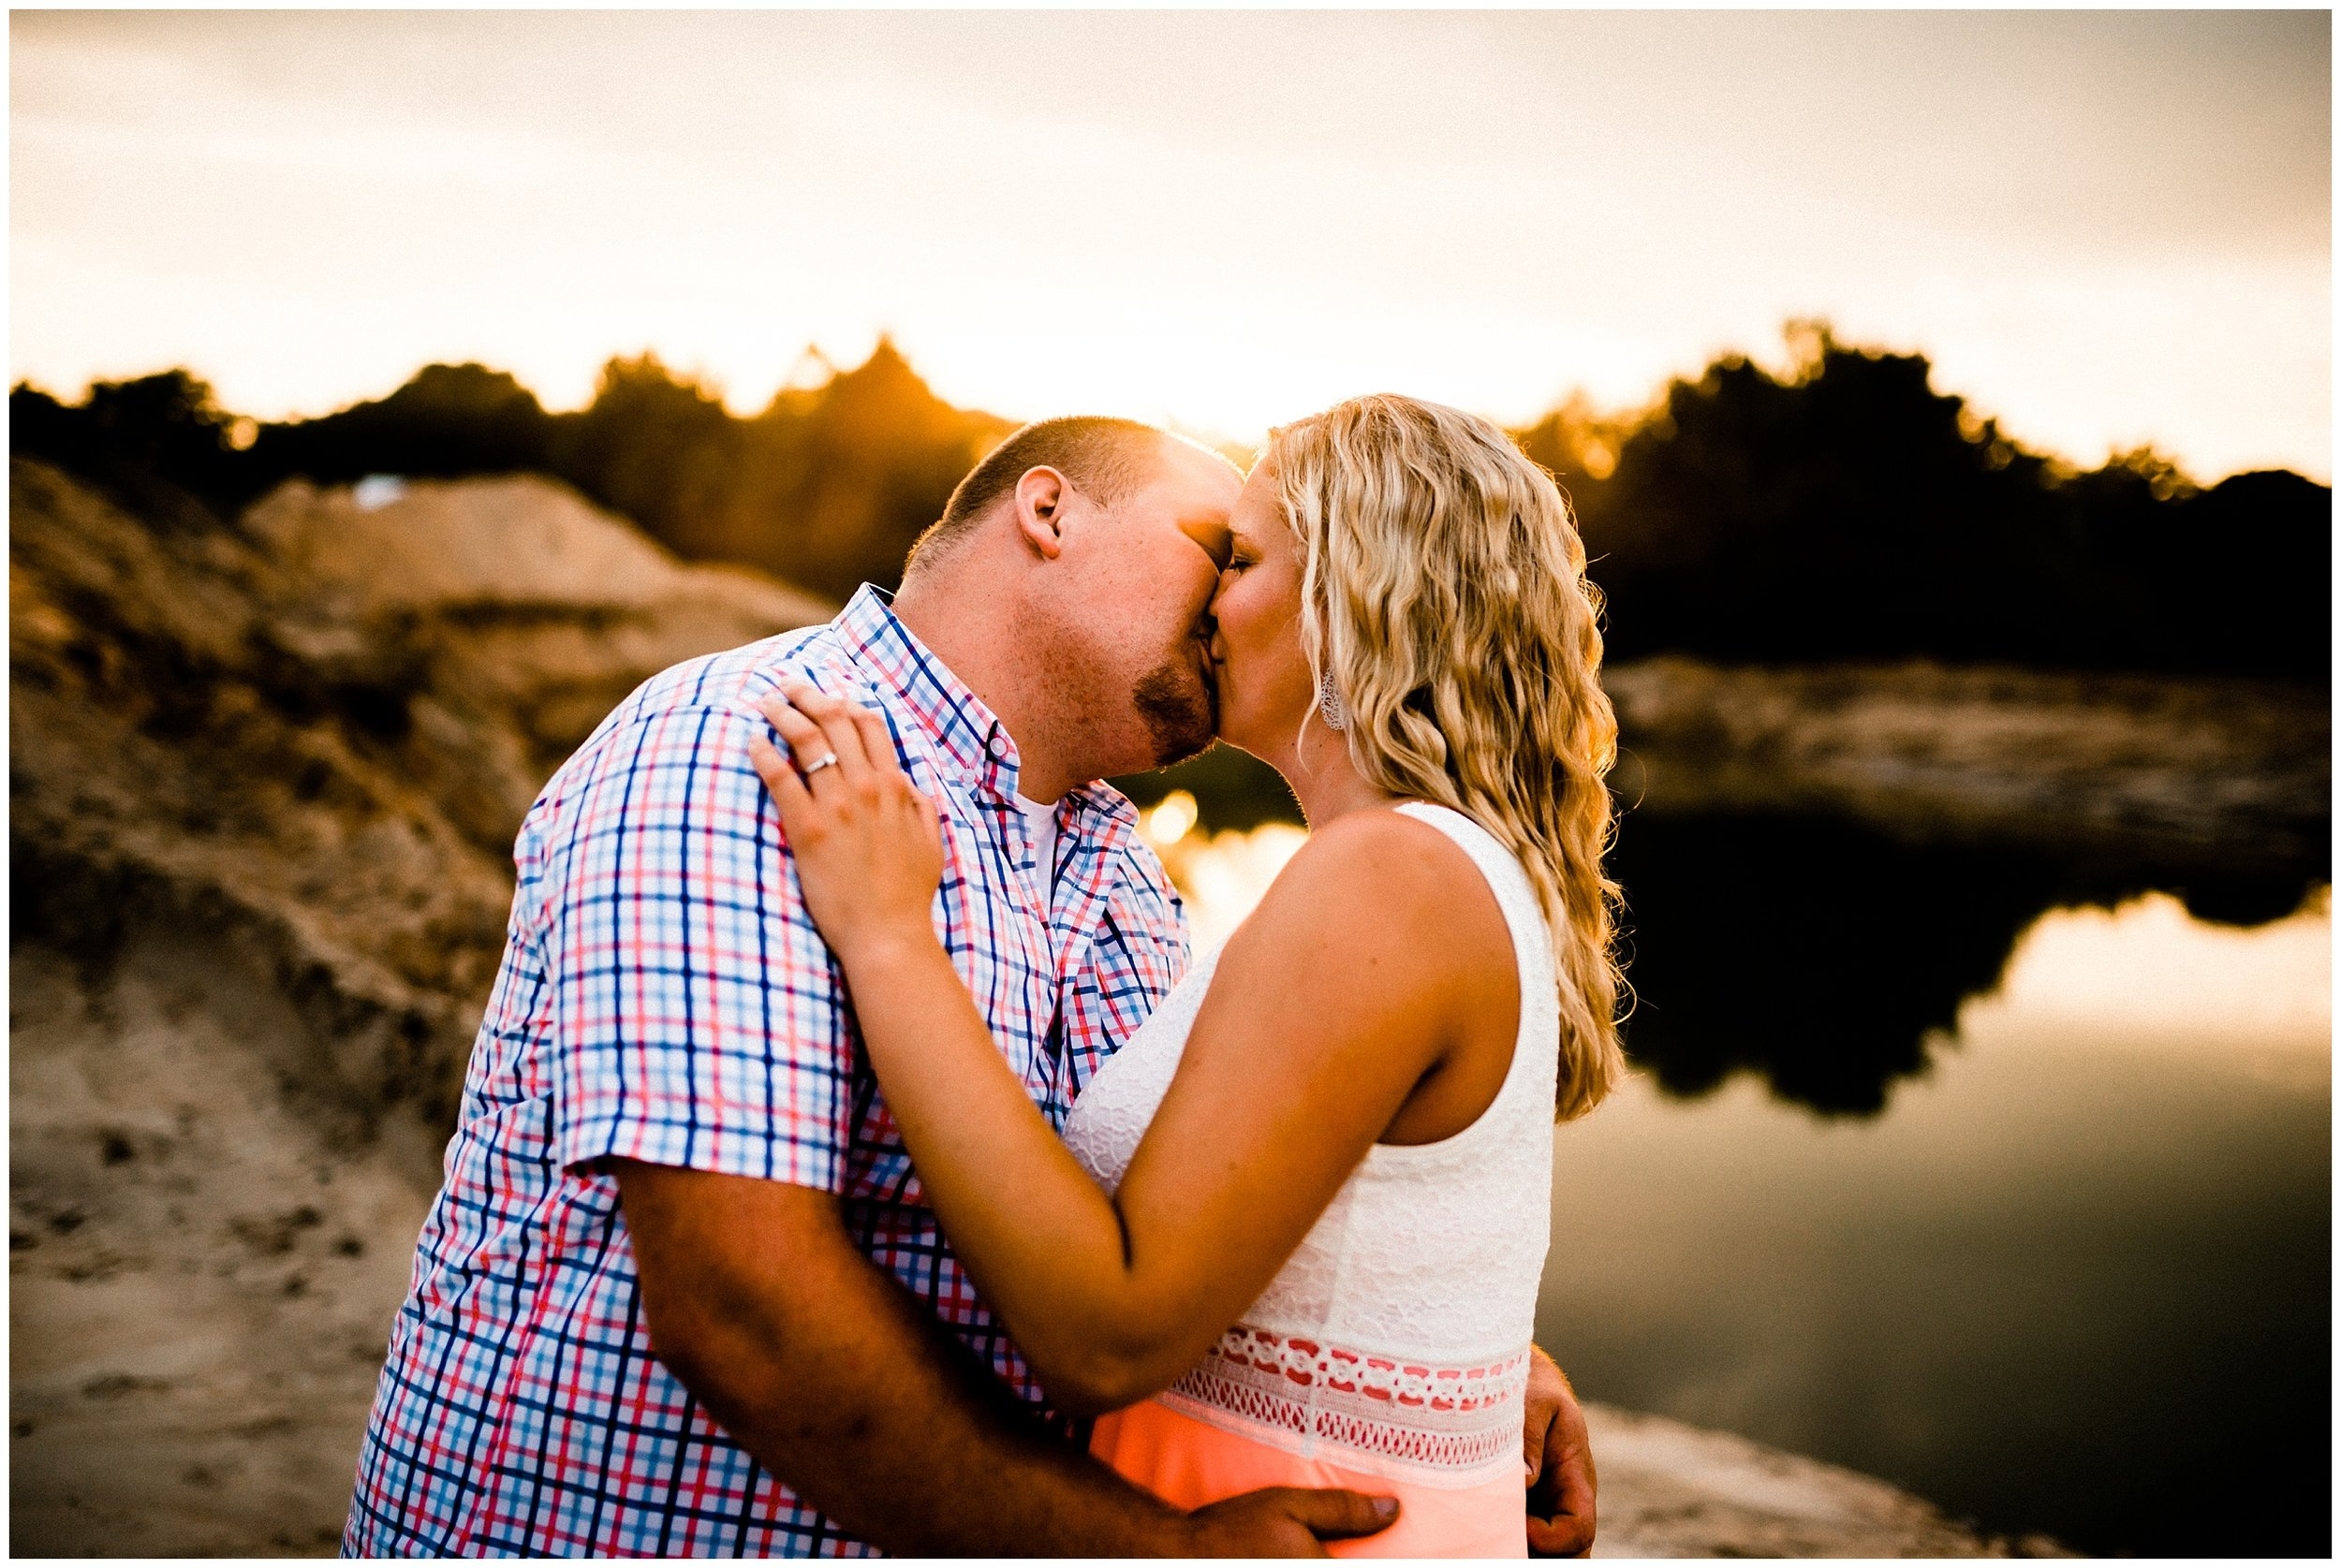 Nate + Tamryn | Engaged #kyleepaigephotography_1042.jpg